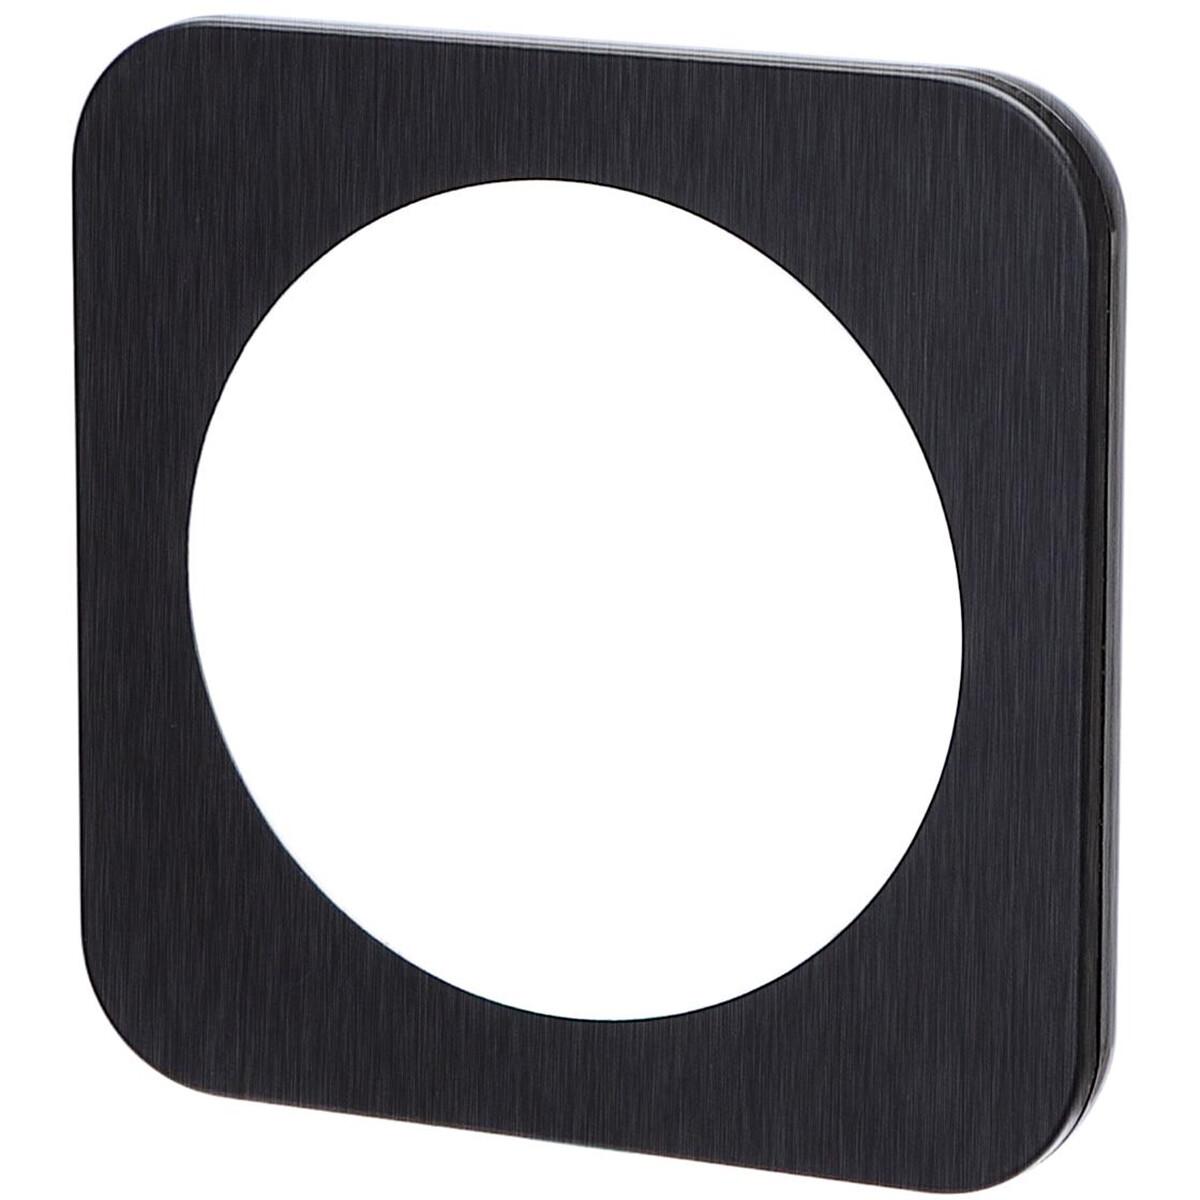 Afdekraam - Aigi Jura - 1-voudig - Rond - Aluminium - Zwart